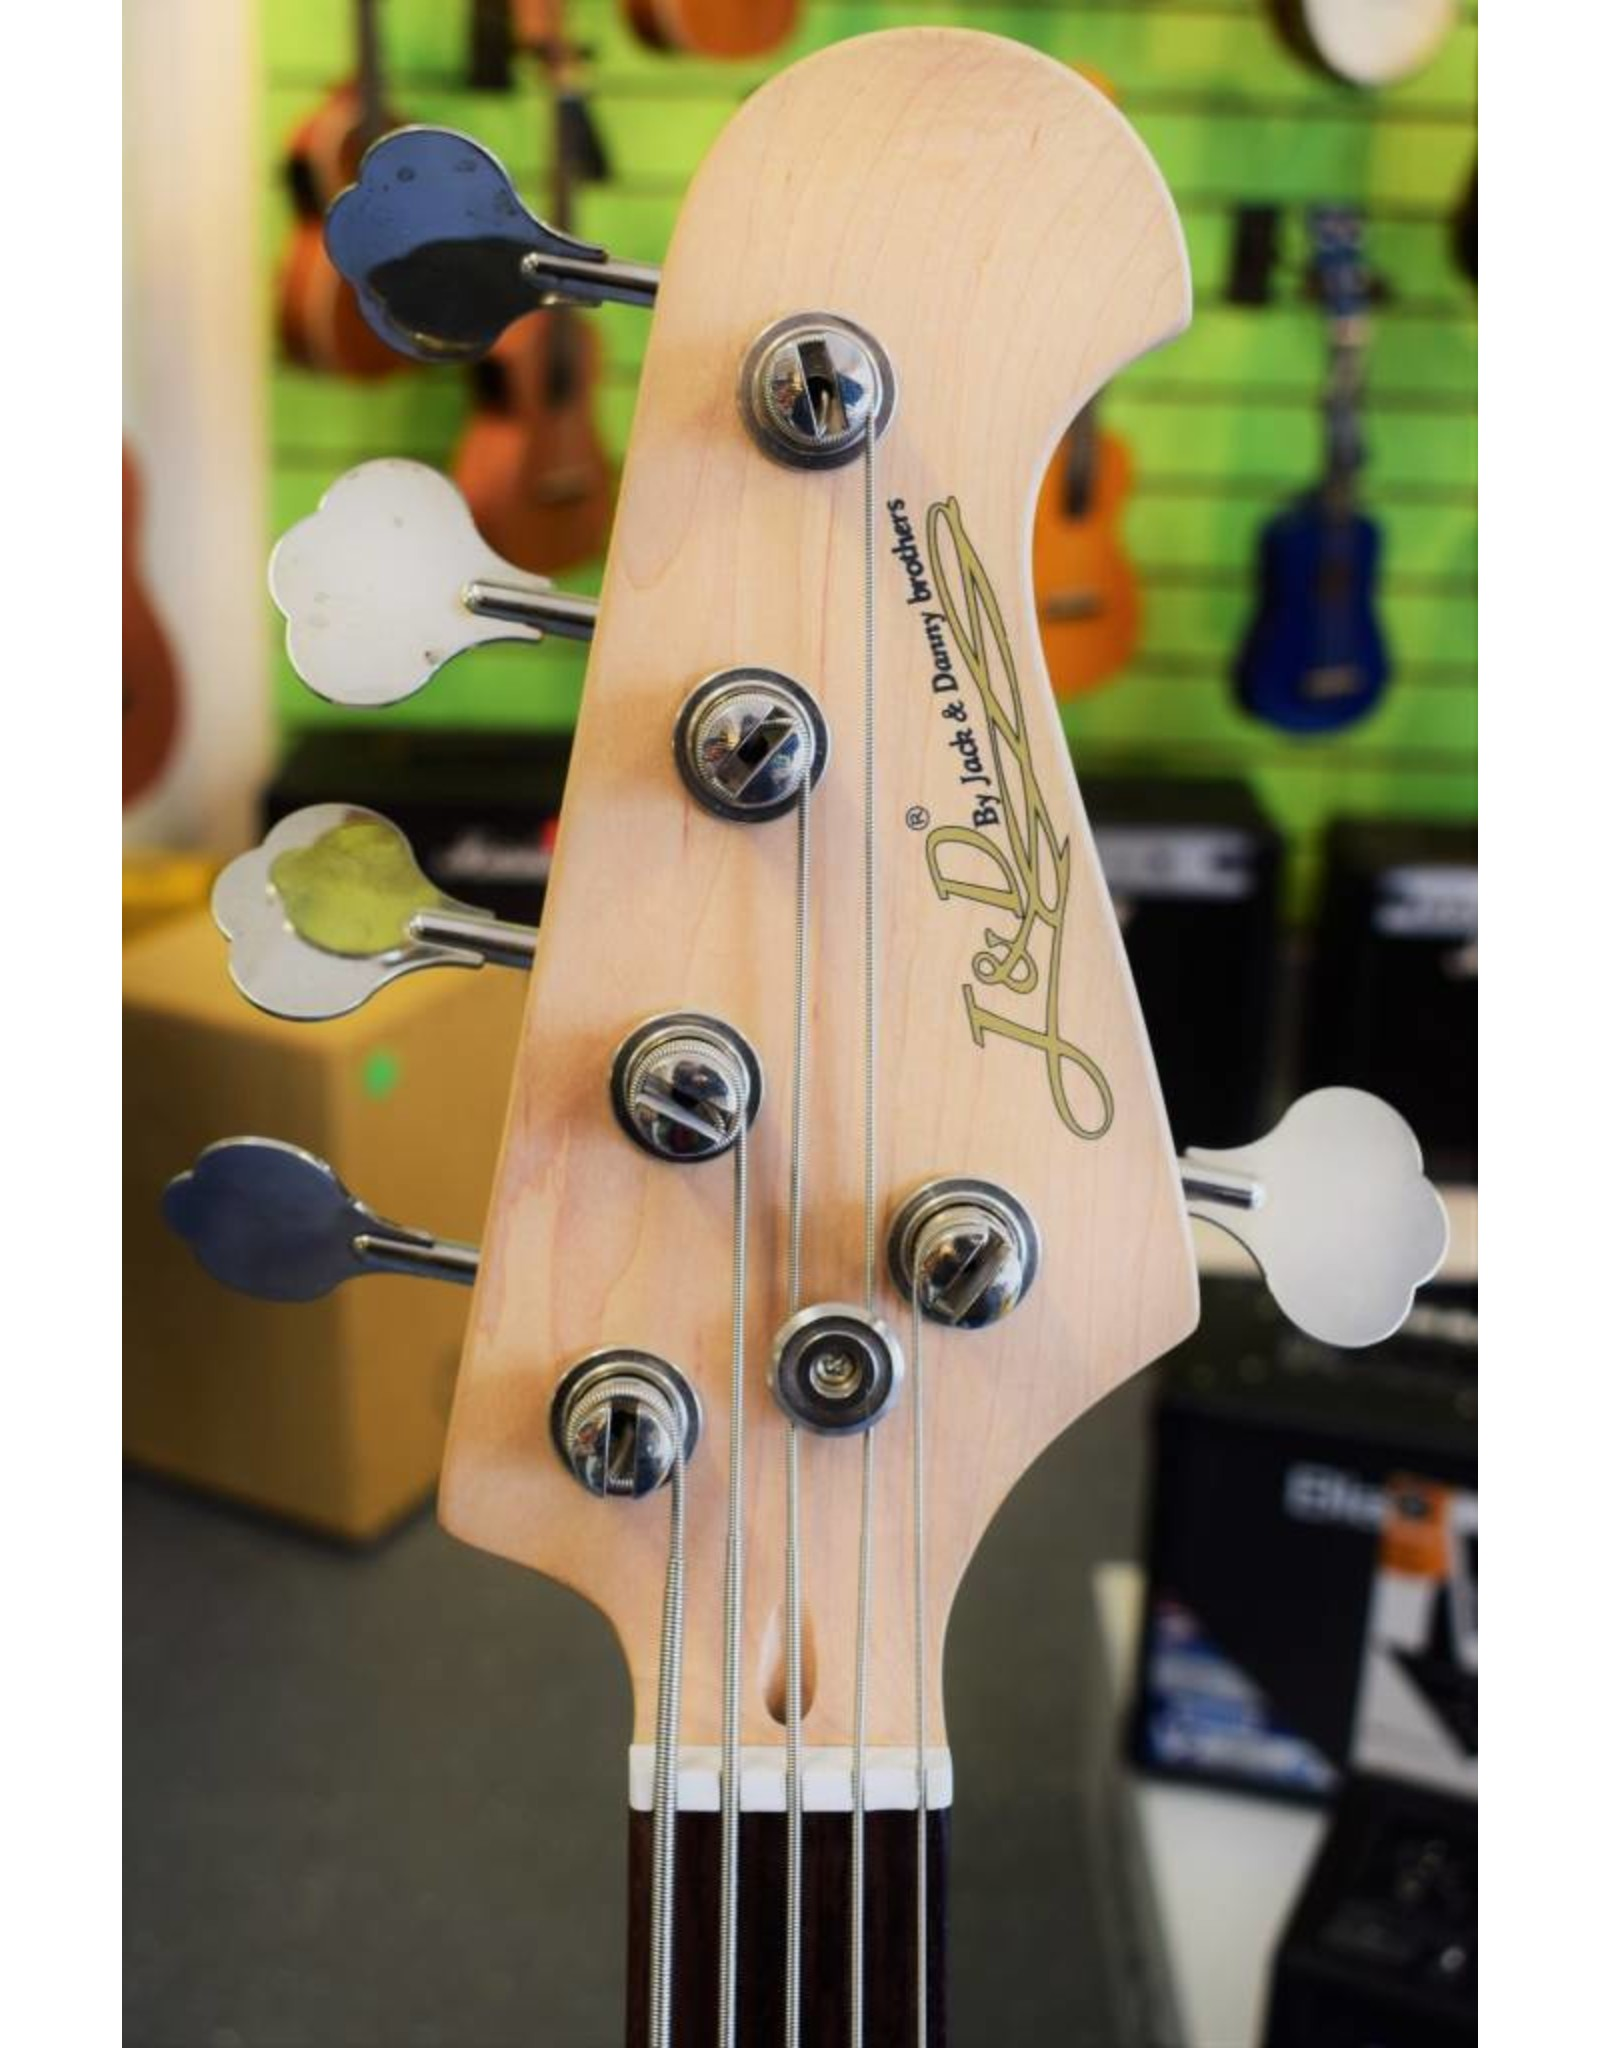 J&D 5 String JB